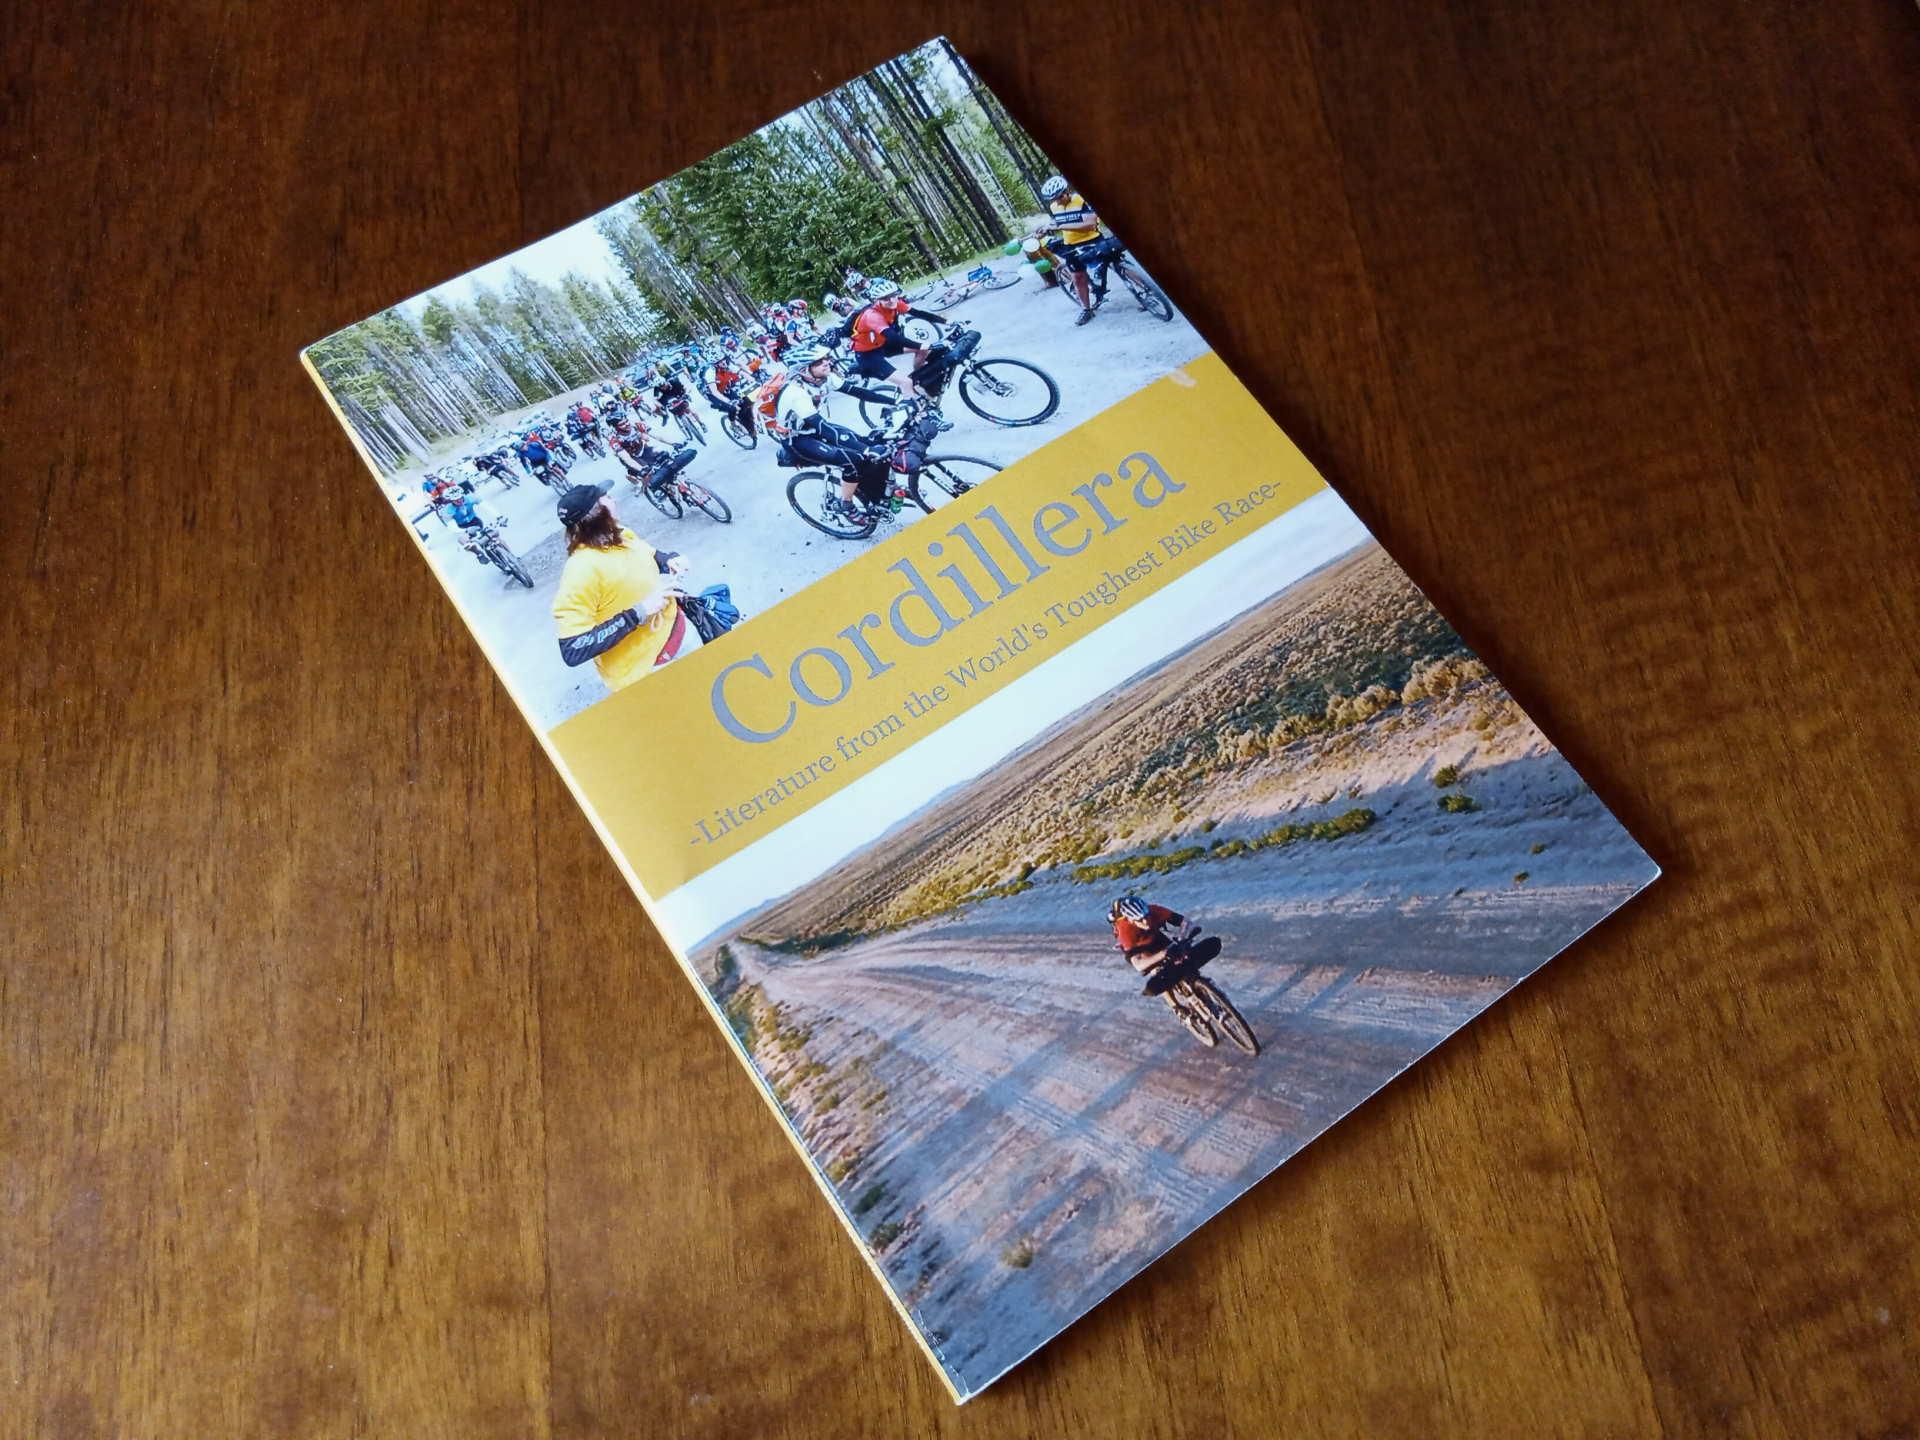 Cordillera book downloaded onto laptop